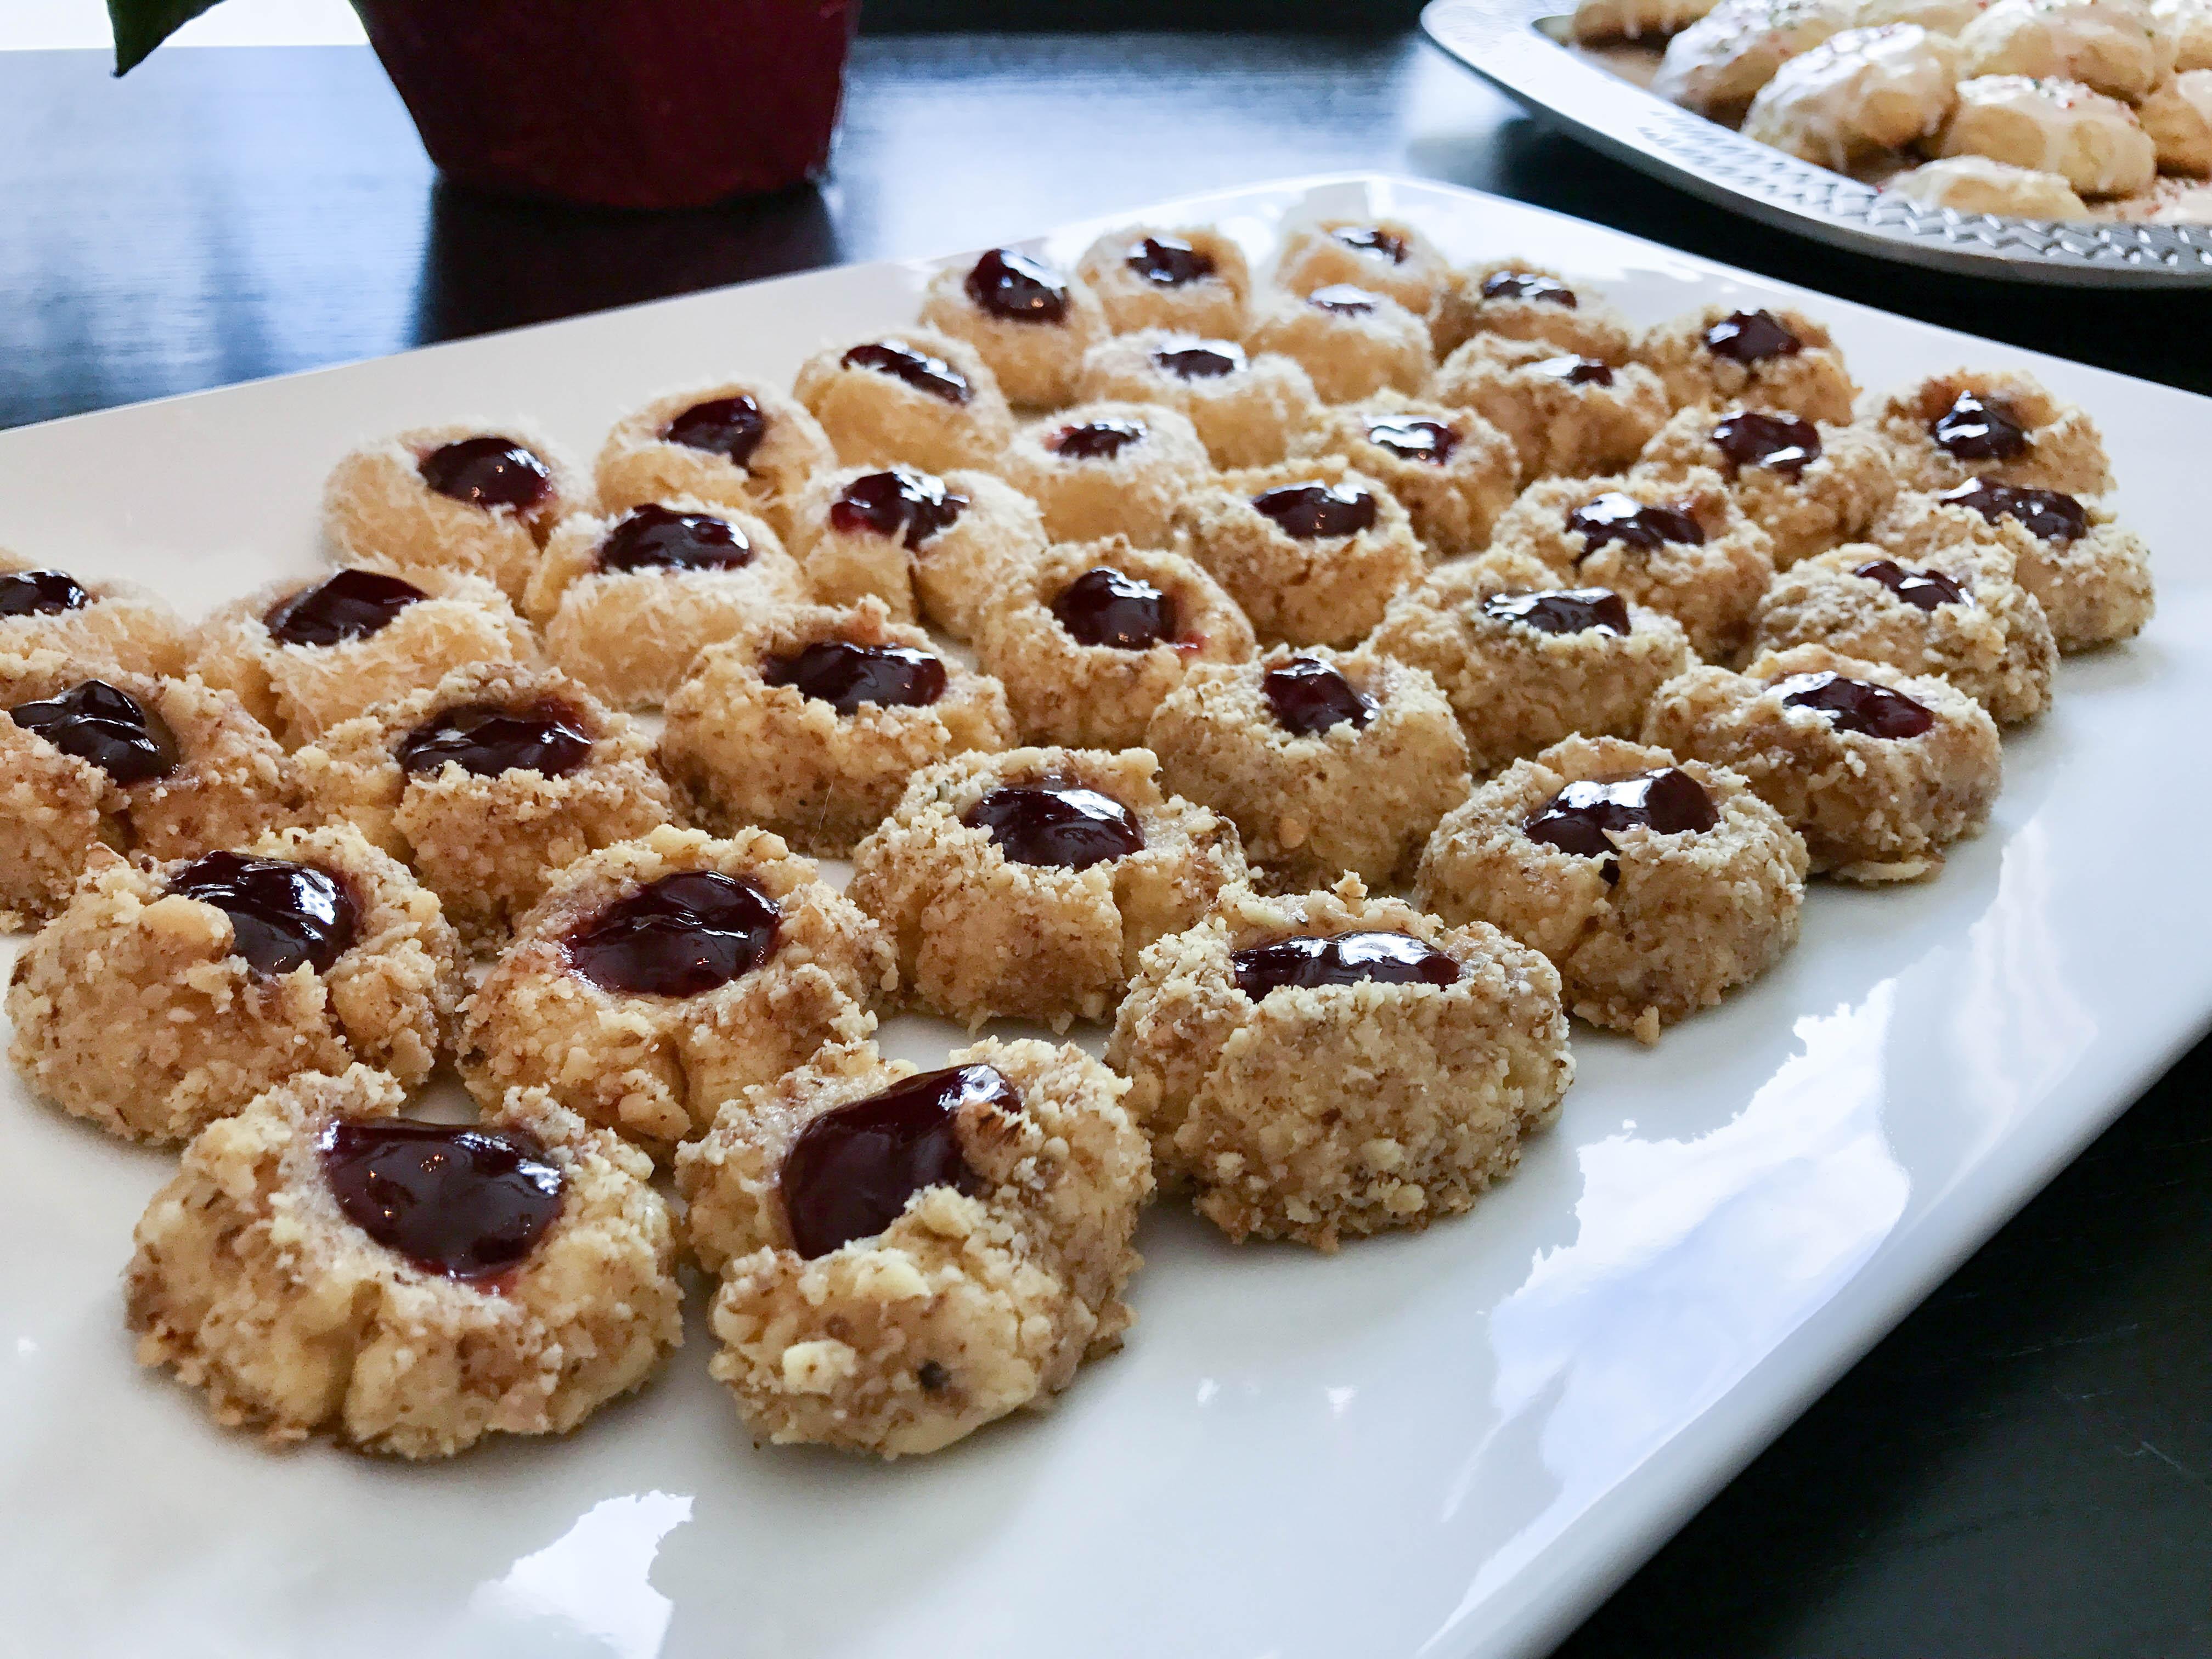 Cooking COREner with Club Pilates - Raspberry Walnut Italian Thumbprints